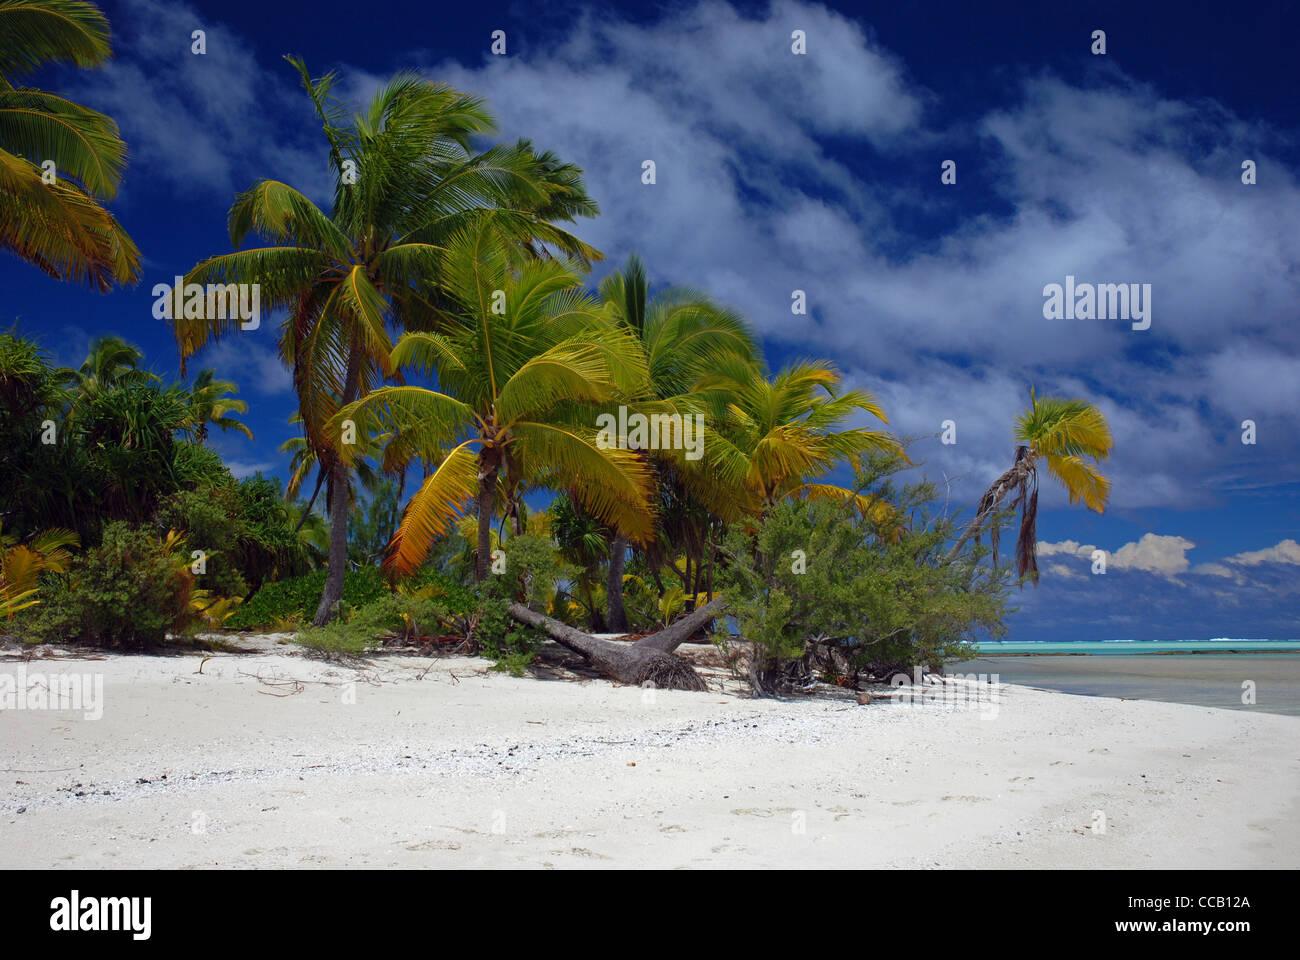 Coconut palms trees and white sand beach and blue sky, Tapuaetai island (one foot island), Aitutaki atoll, Cook - Stock Image